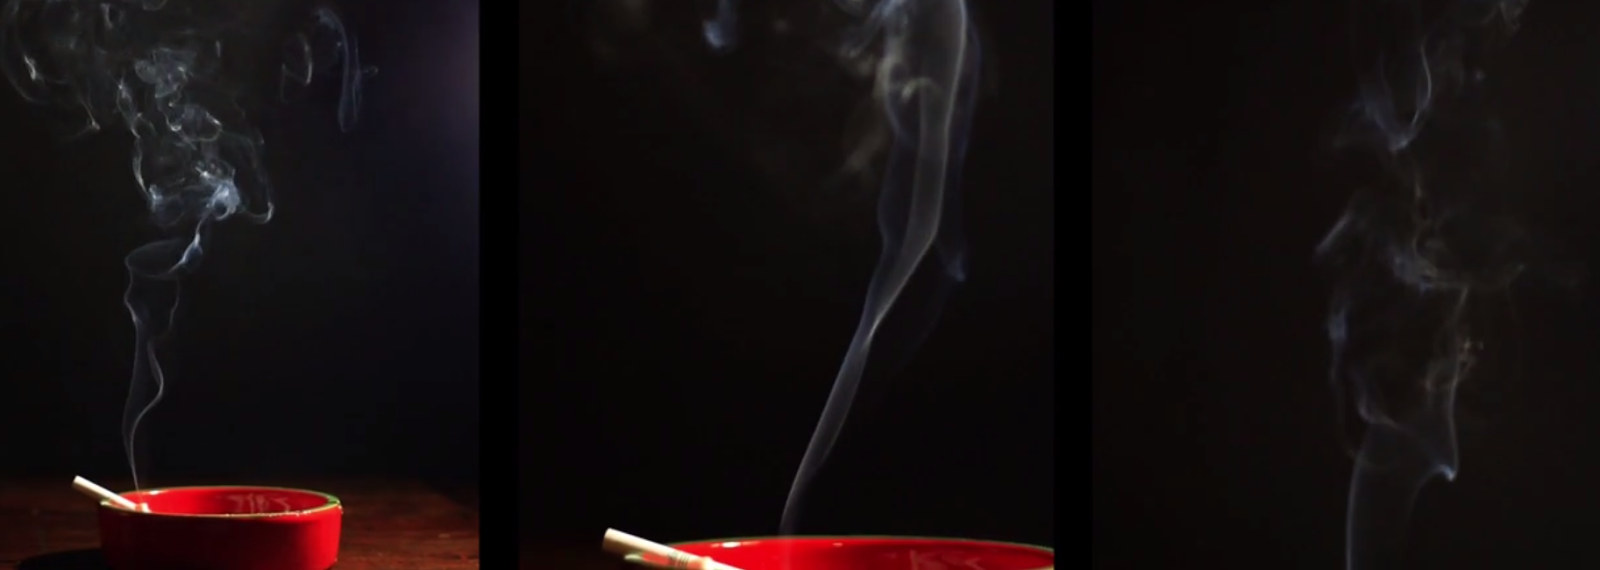 FX Thinking: Cigarette Smoke - Part 1